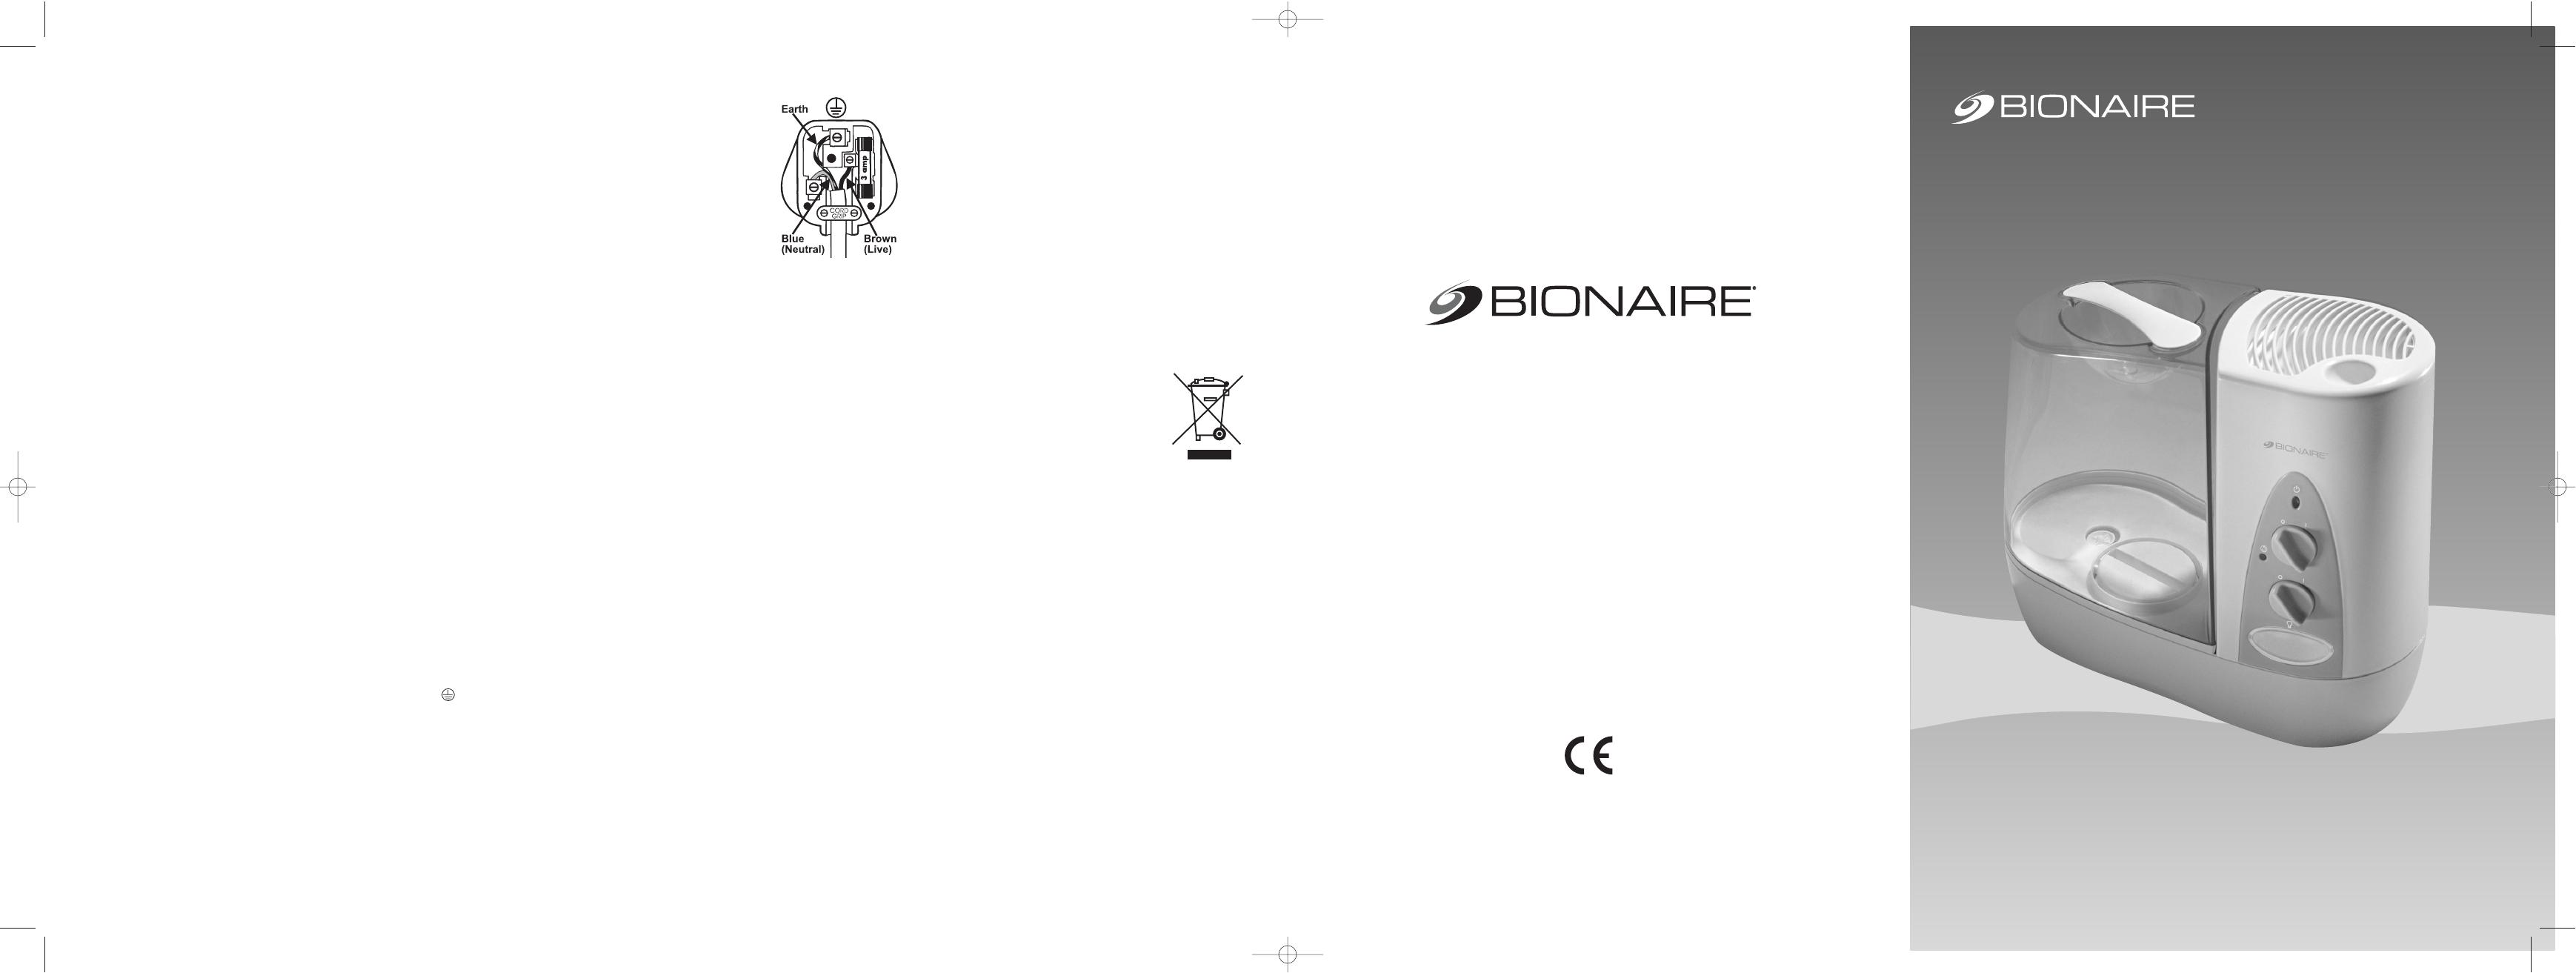 Bwm5075 5075ciuk07em1 Bwm5075c Iuk 43 7594830 Bionaire Wiring Diagram